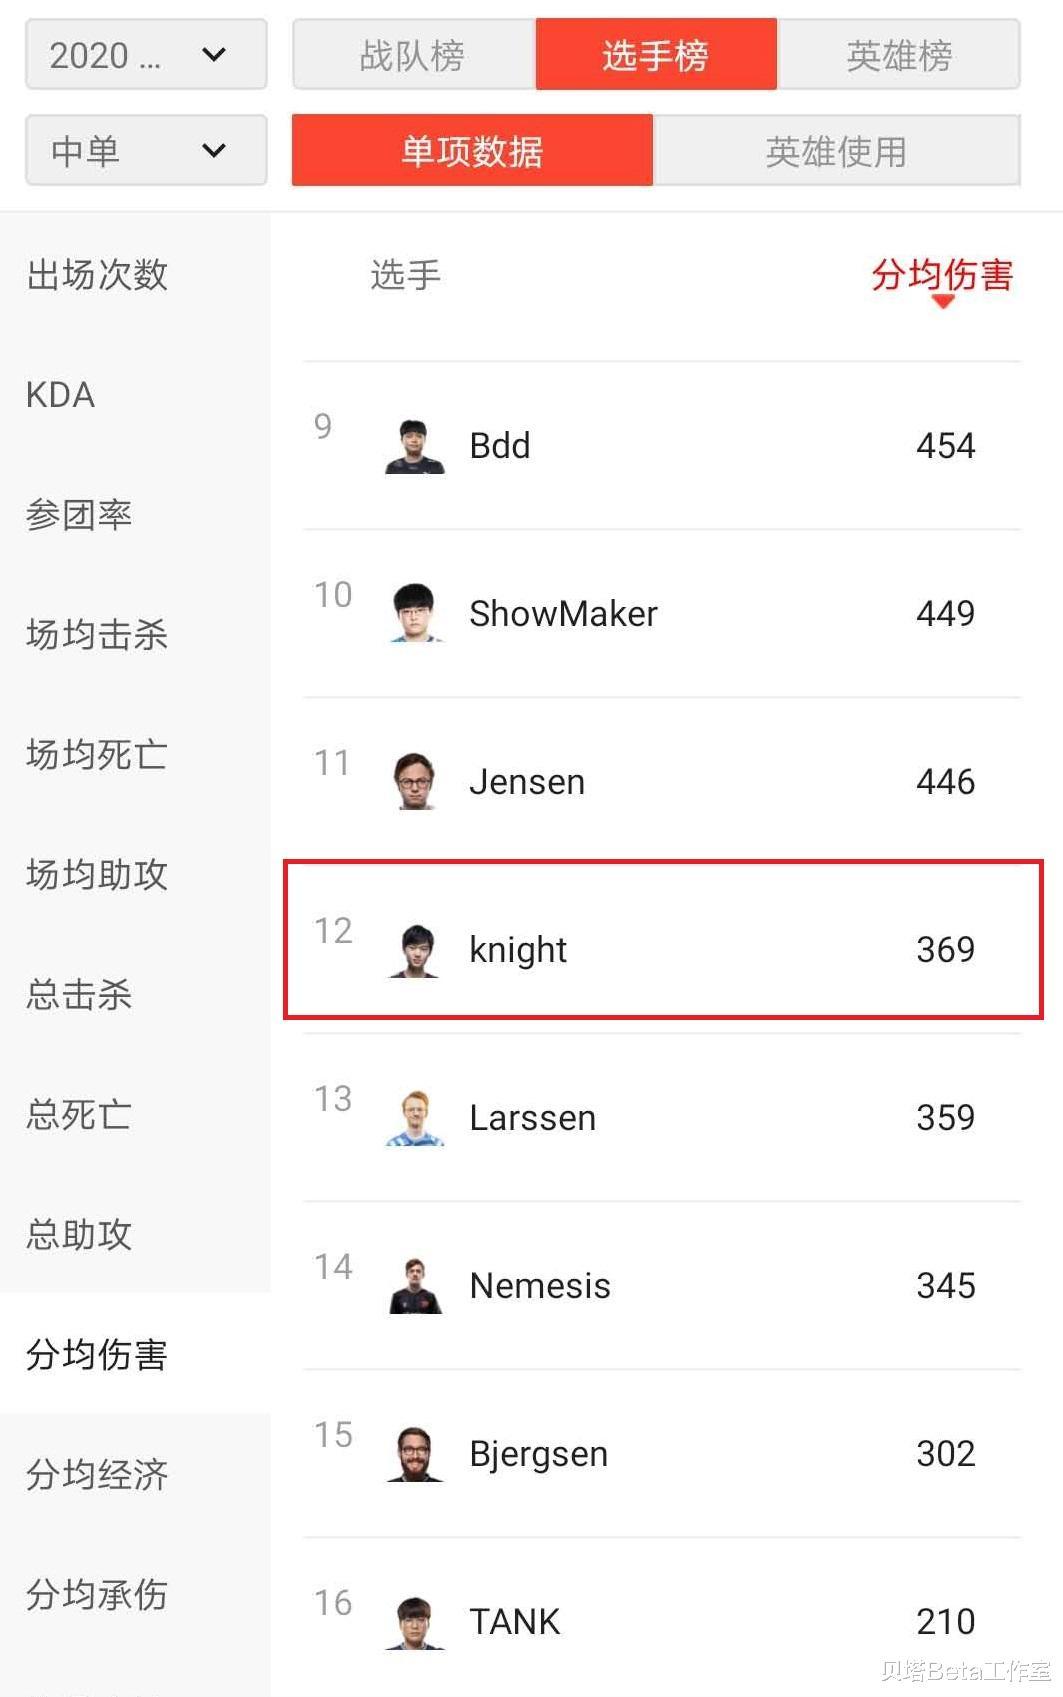 S10小組賽第1輪後,Knight被質疑表現不佳!7項數據排名倒數-圖6